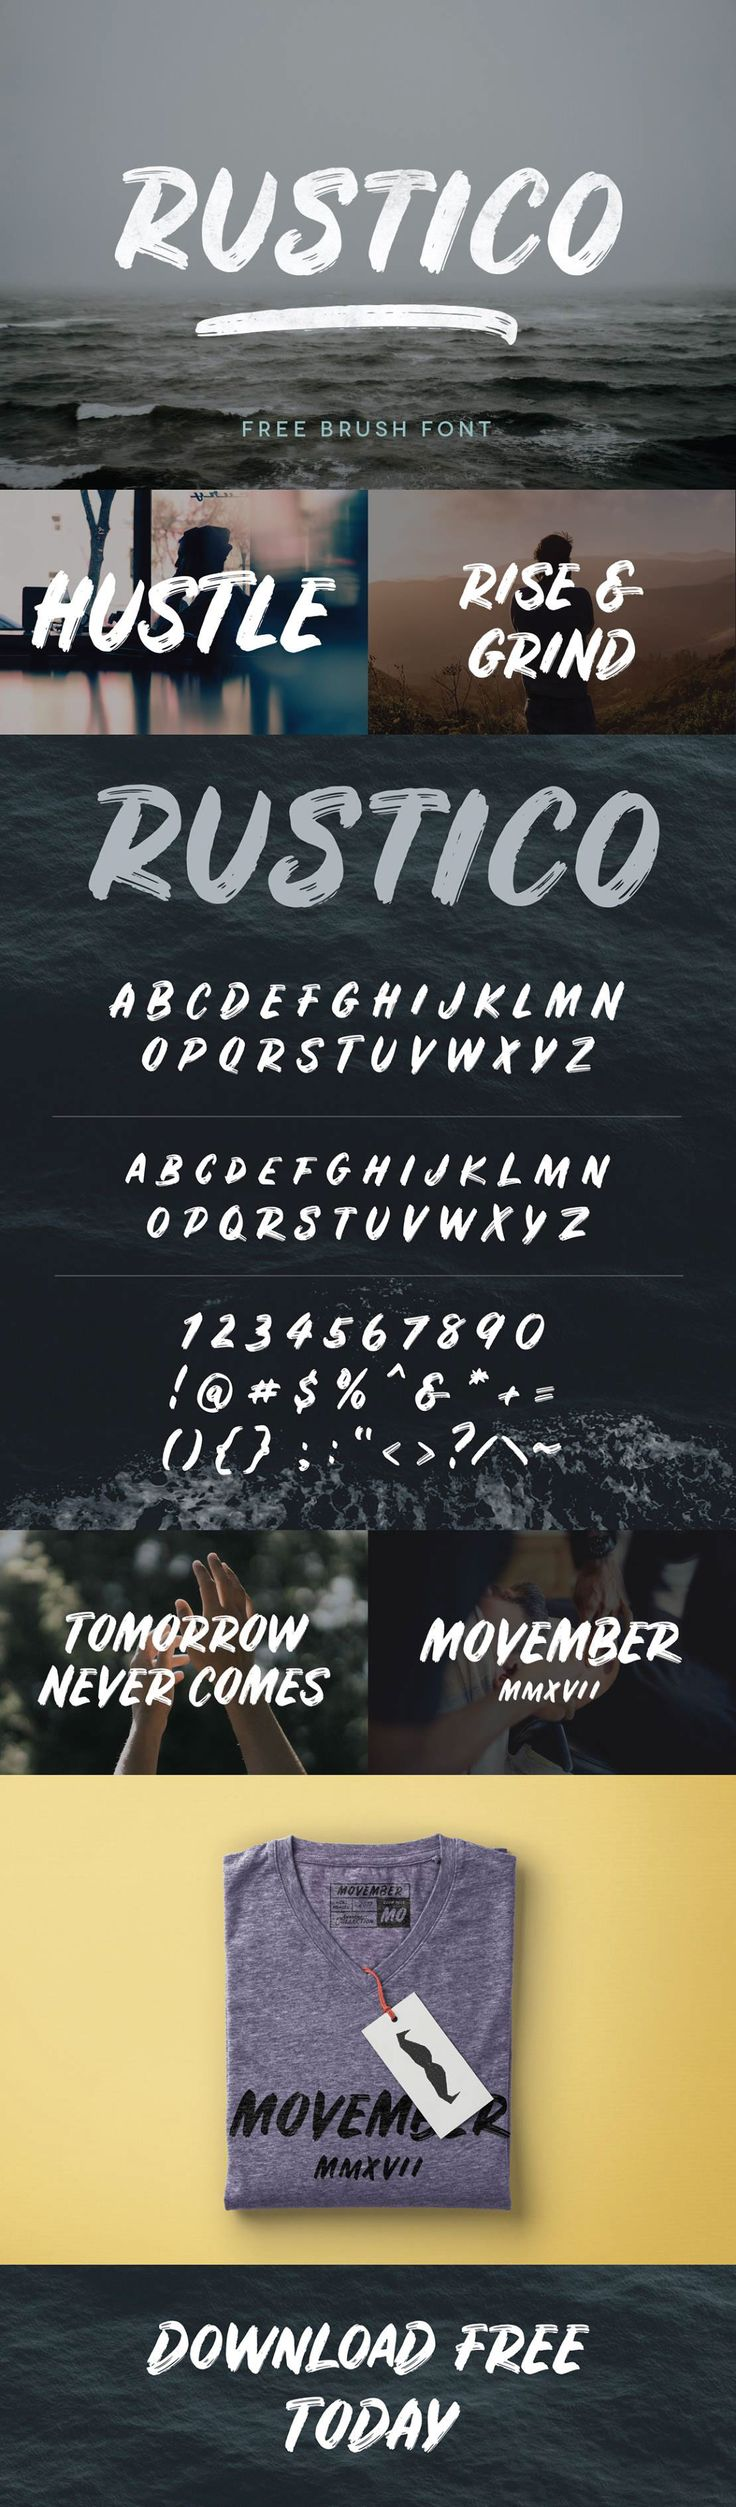 rustico bold brush free font